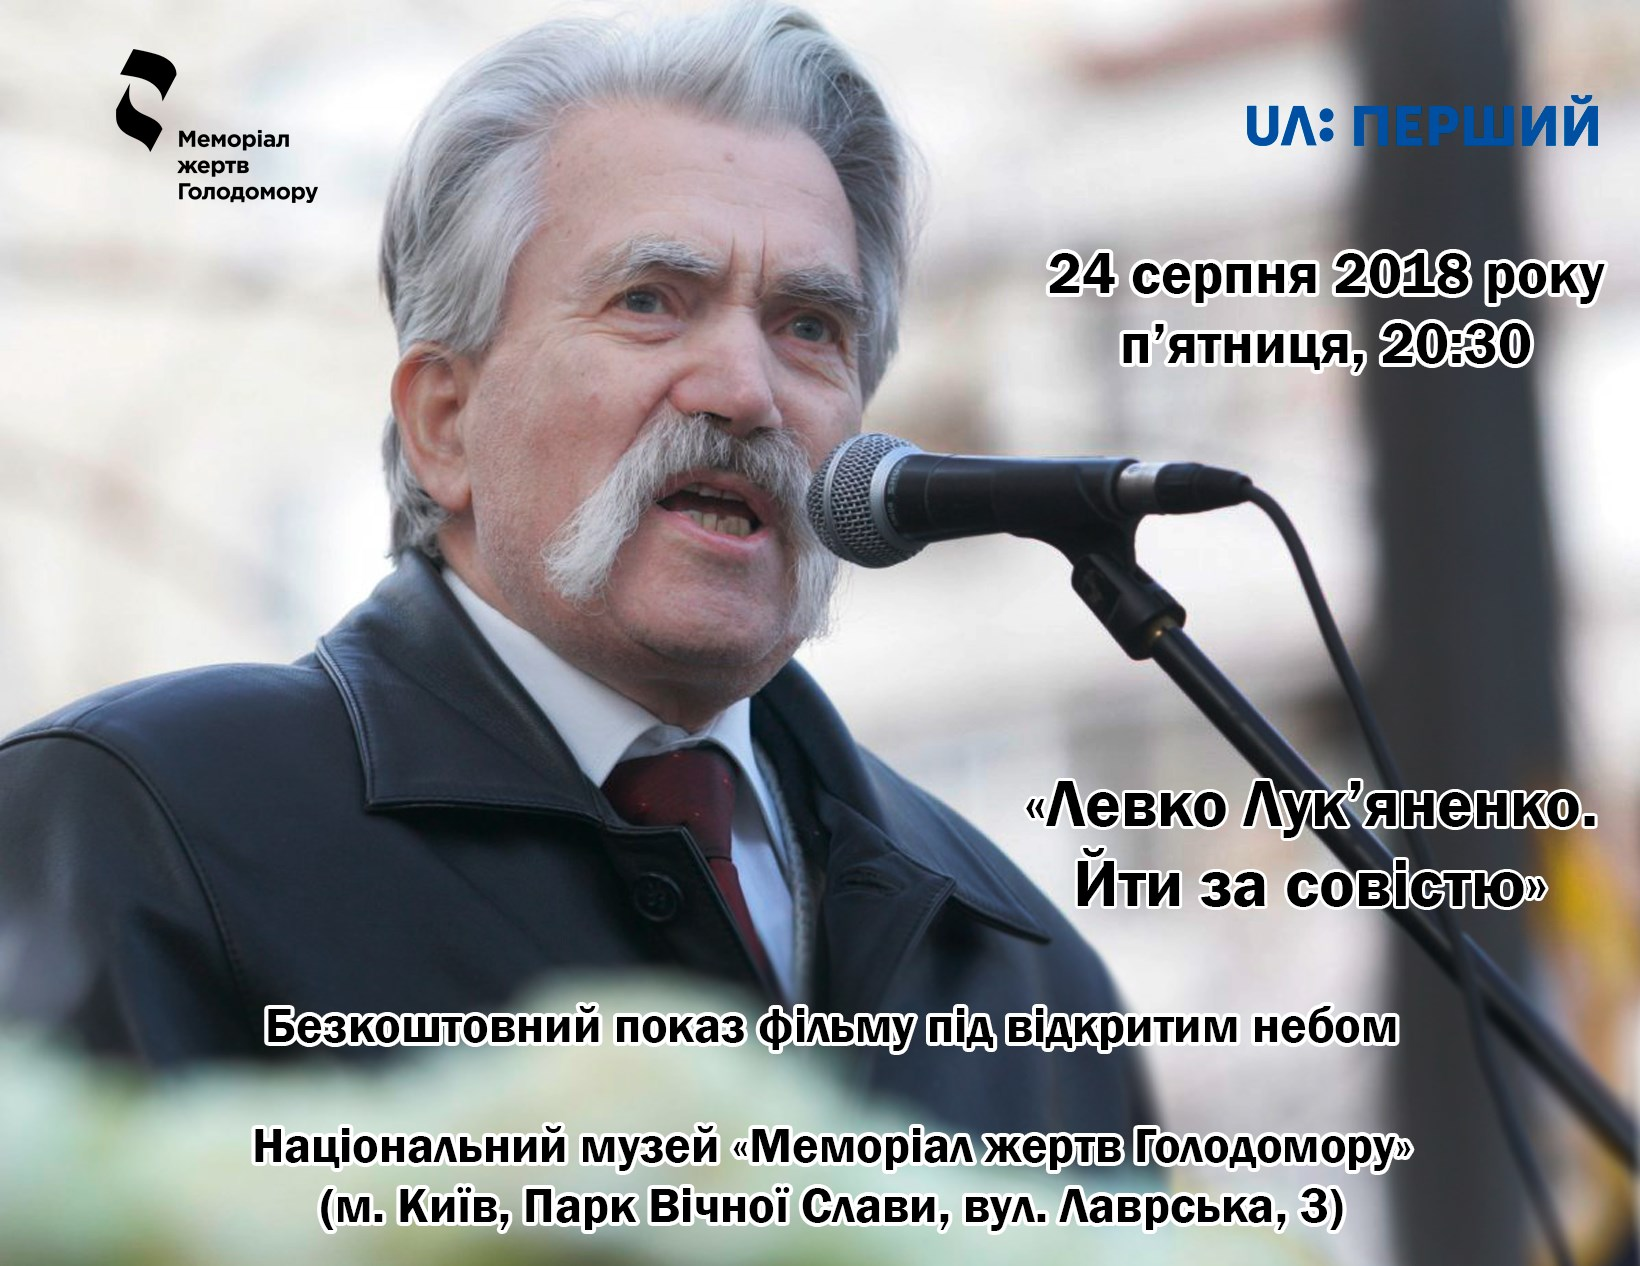 евко Лук'яненко